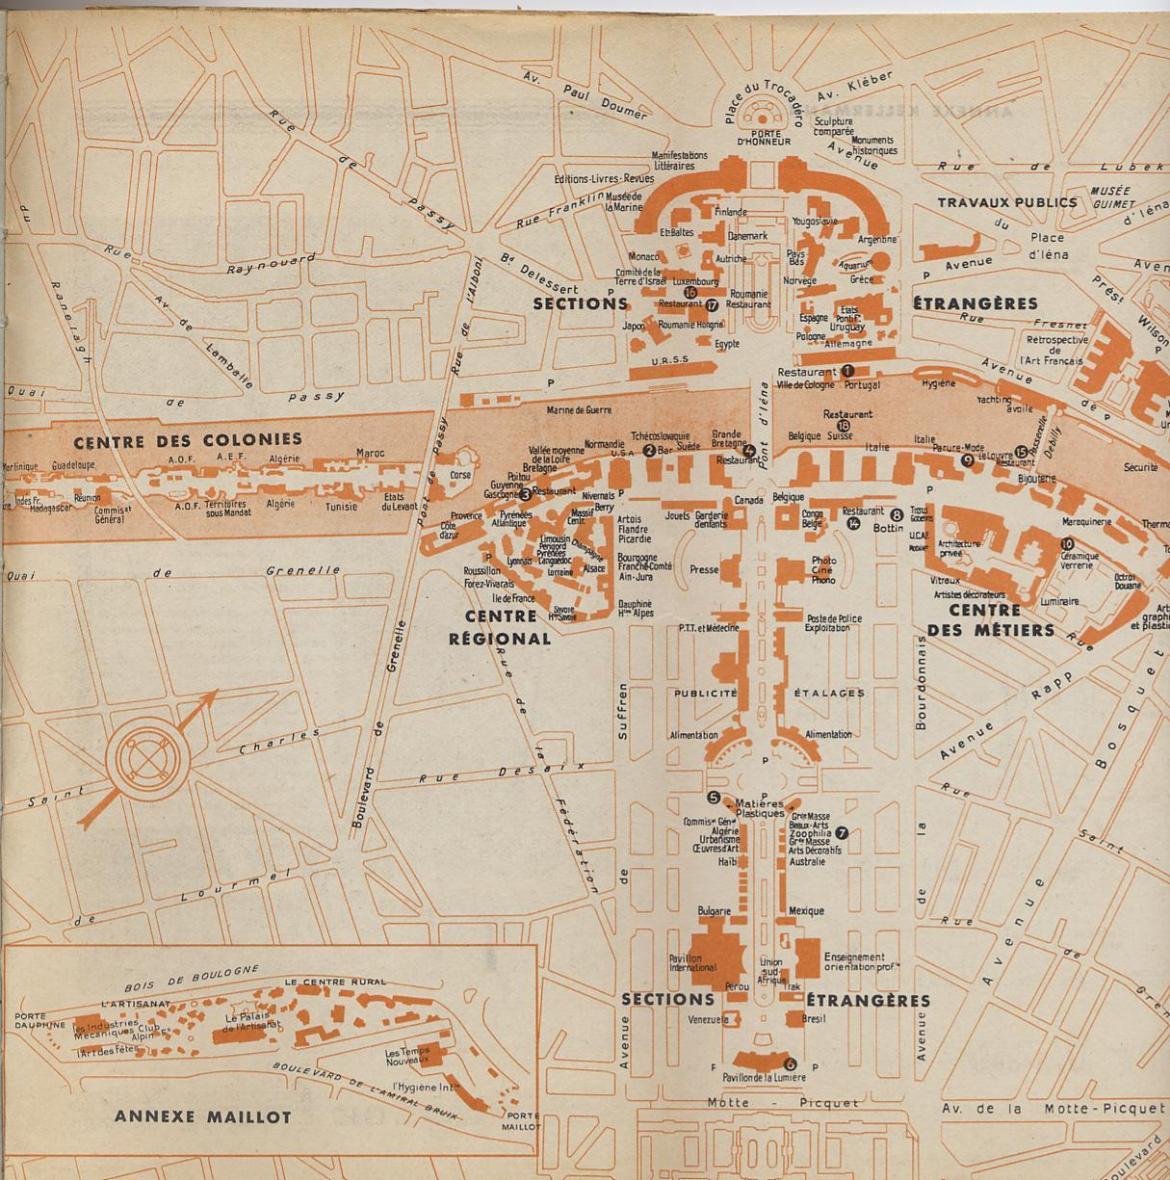 expo-1937-map-paris